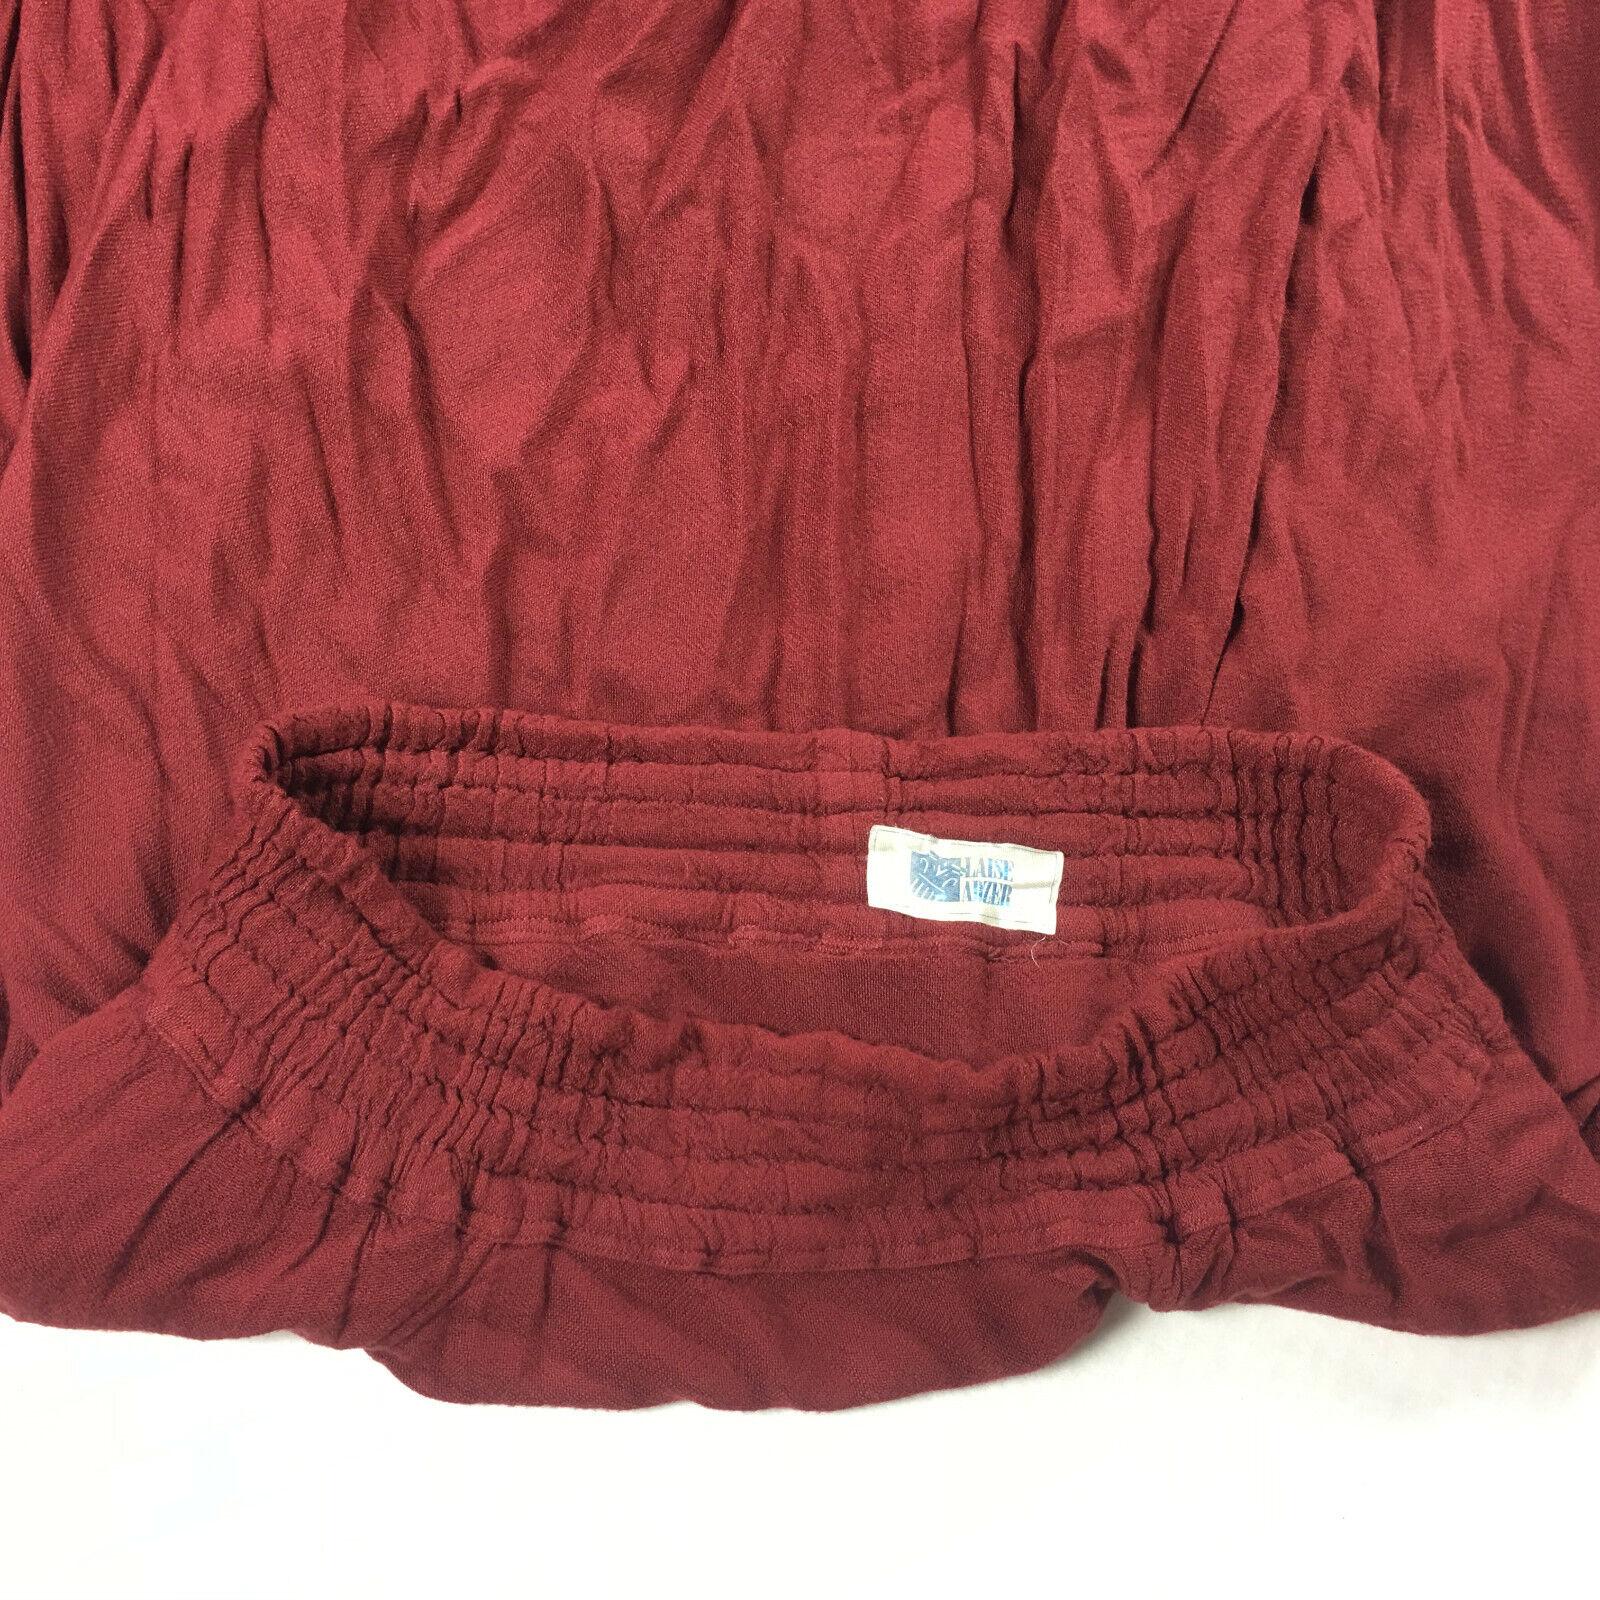 Laise Adzer Skirt Women's Small Medium Large Lage… - image 6